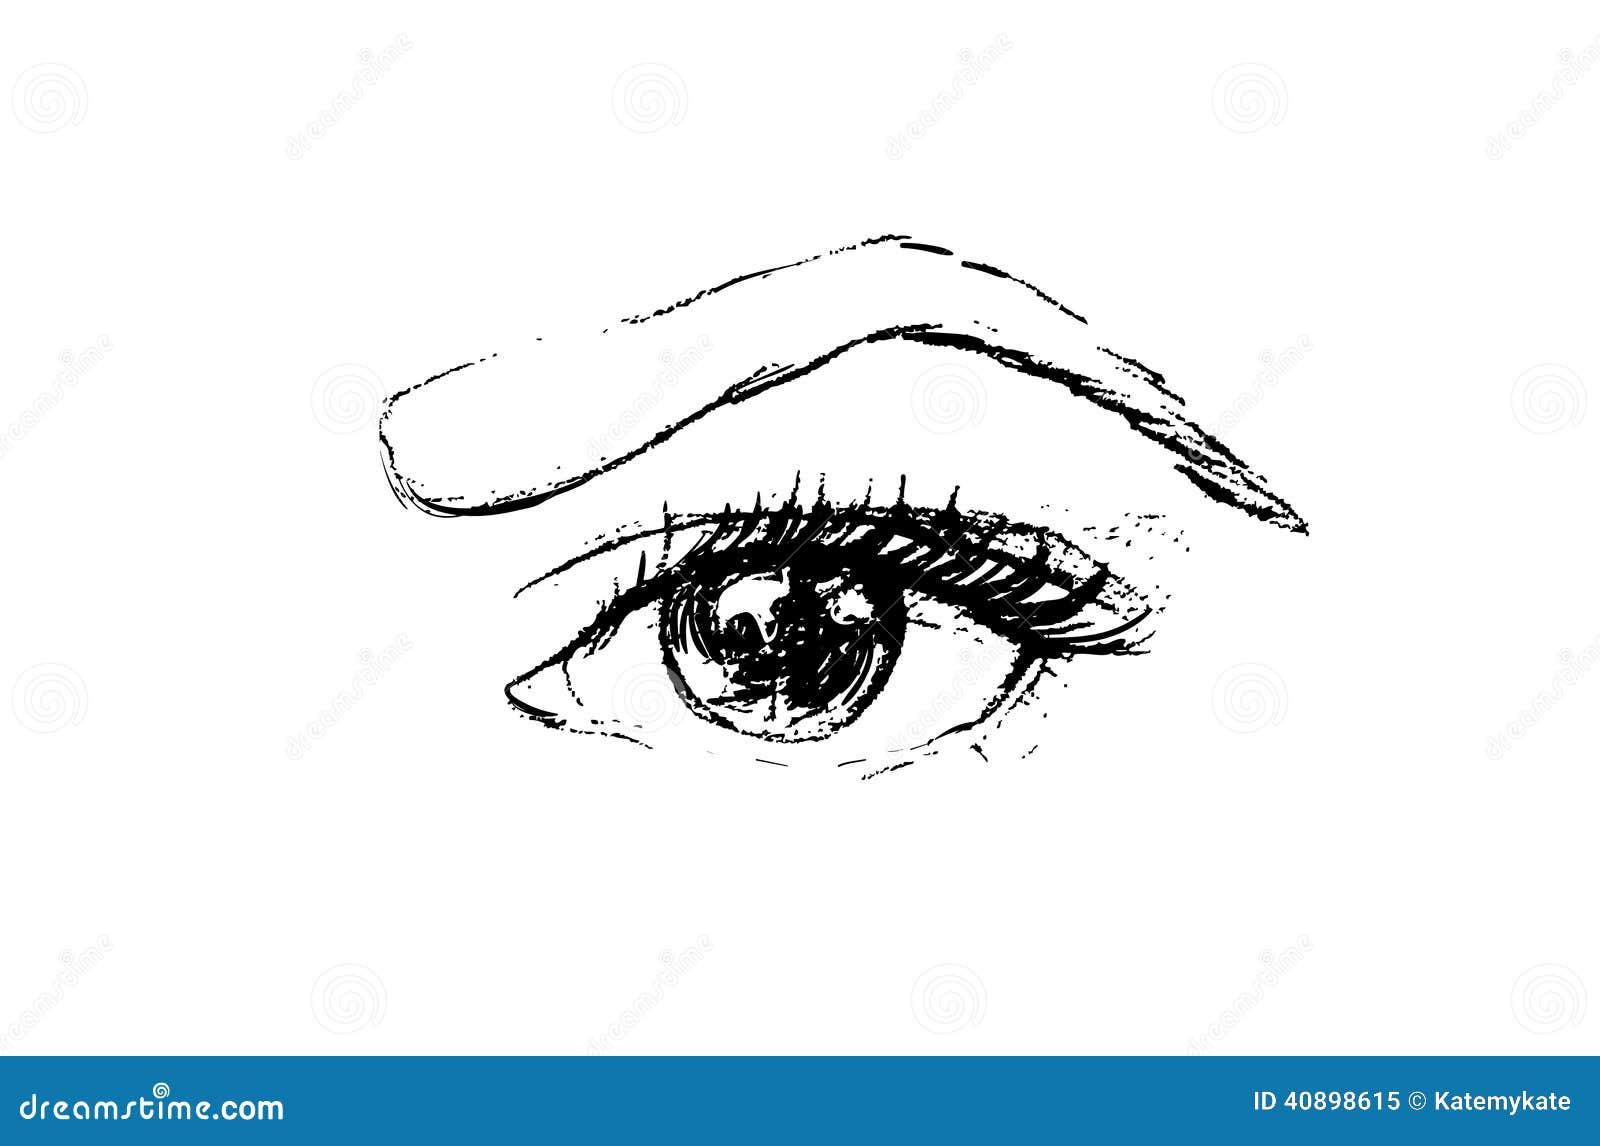 Line Drawing Eye : Hand drawn vector eye line art stock